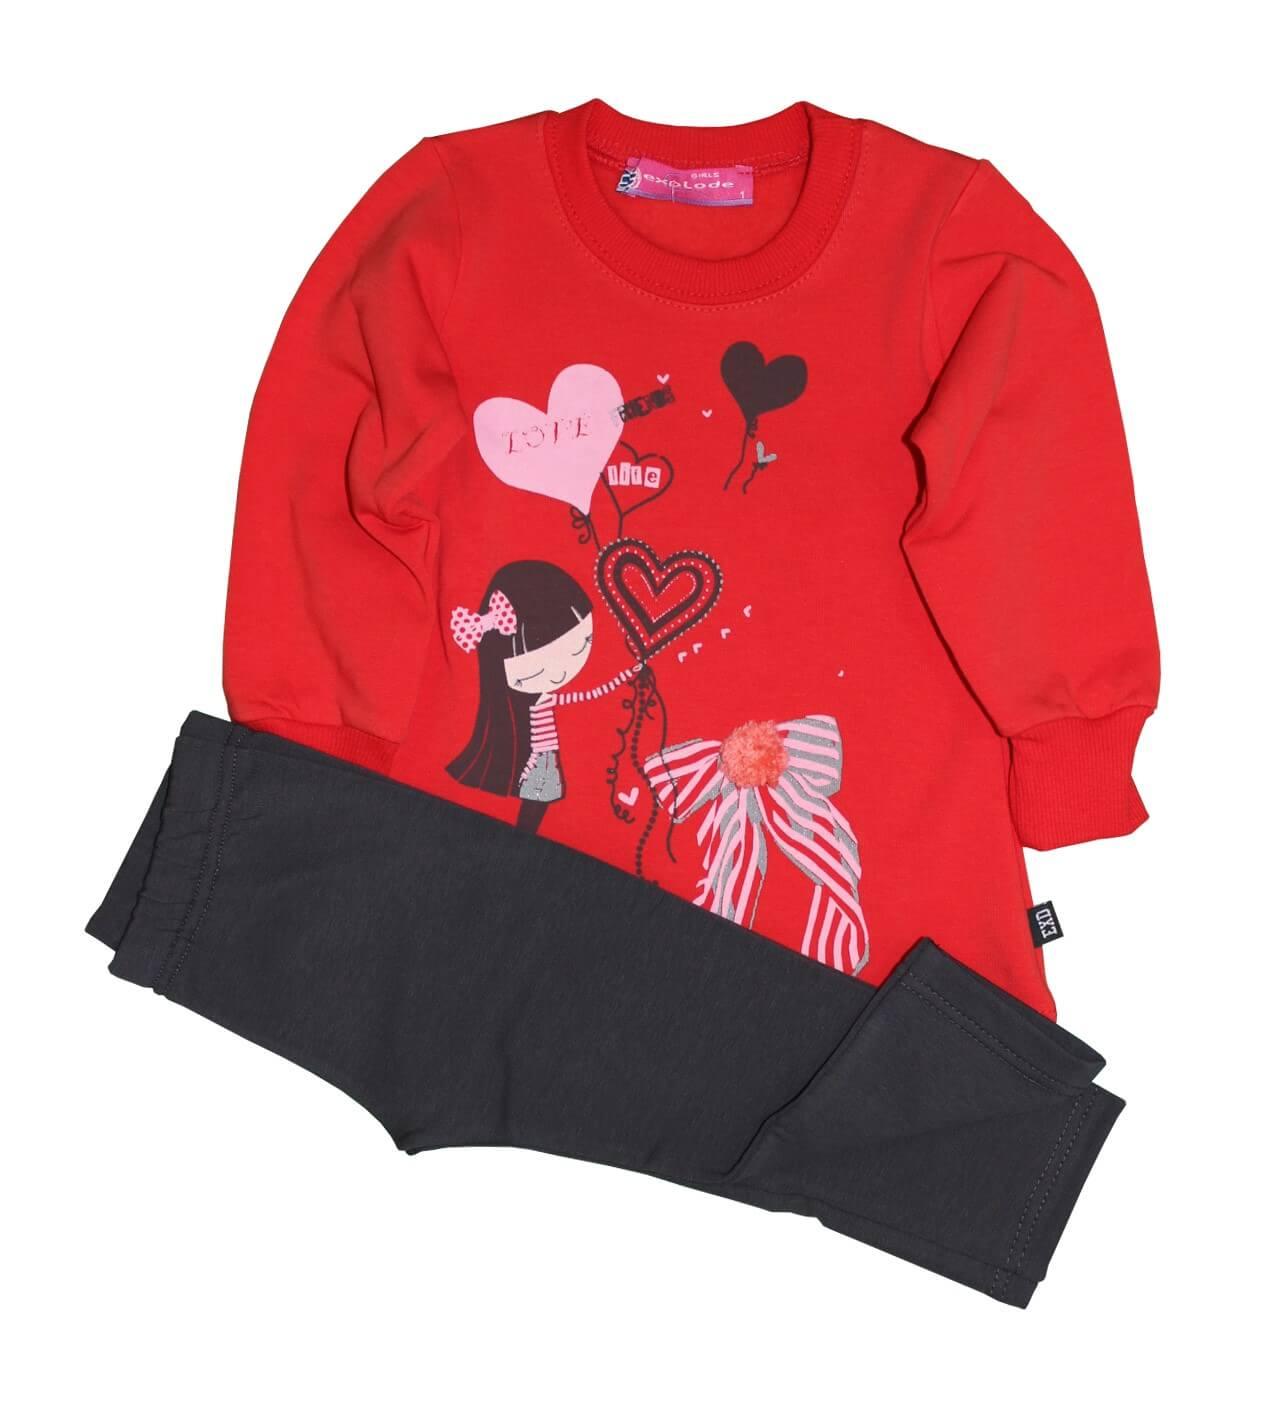 80dbeef4880a Σετ φόρμες κόκκινη μπλούζα σκούρο γκρι παντελόνι σχέδιο LOVE EXPLODE 13169